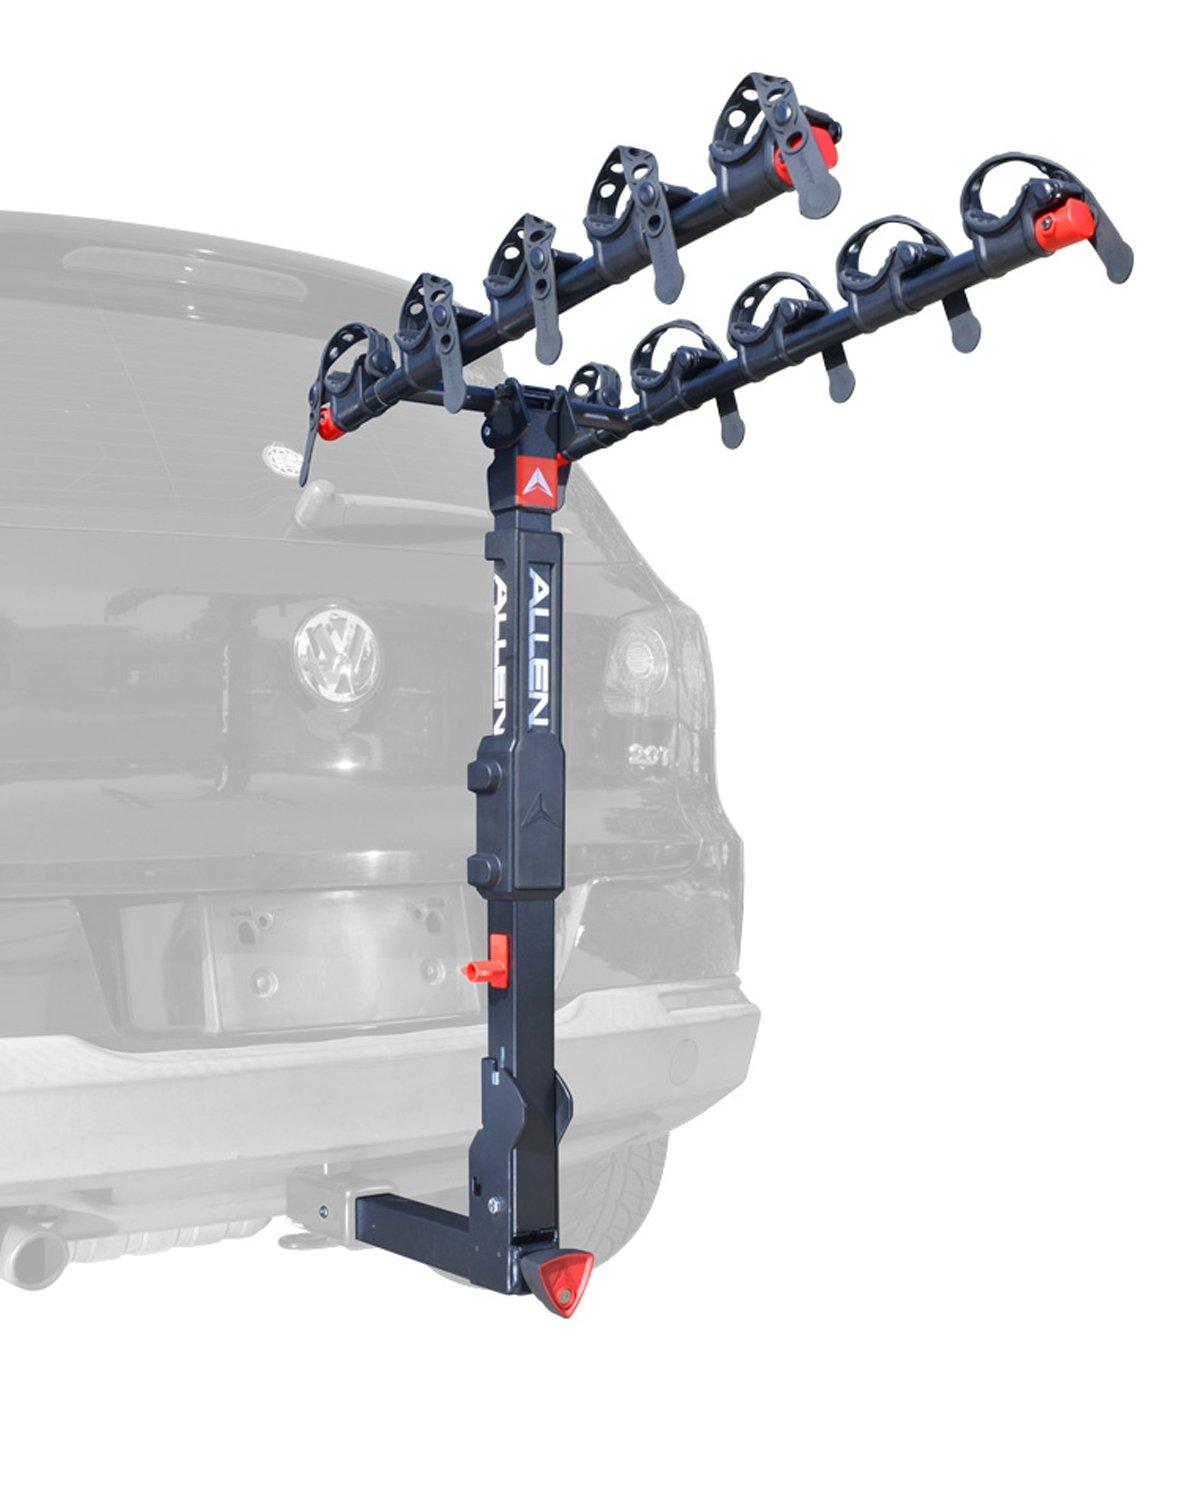 Allen Sports Premier Locking Quick Release 5-Bike Carrier for 2 in. Hitch by Allen Sports